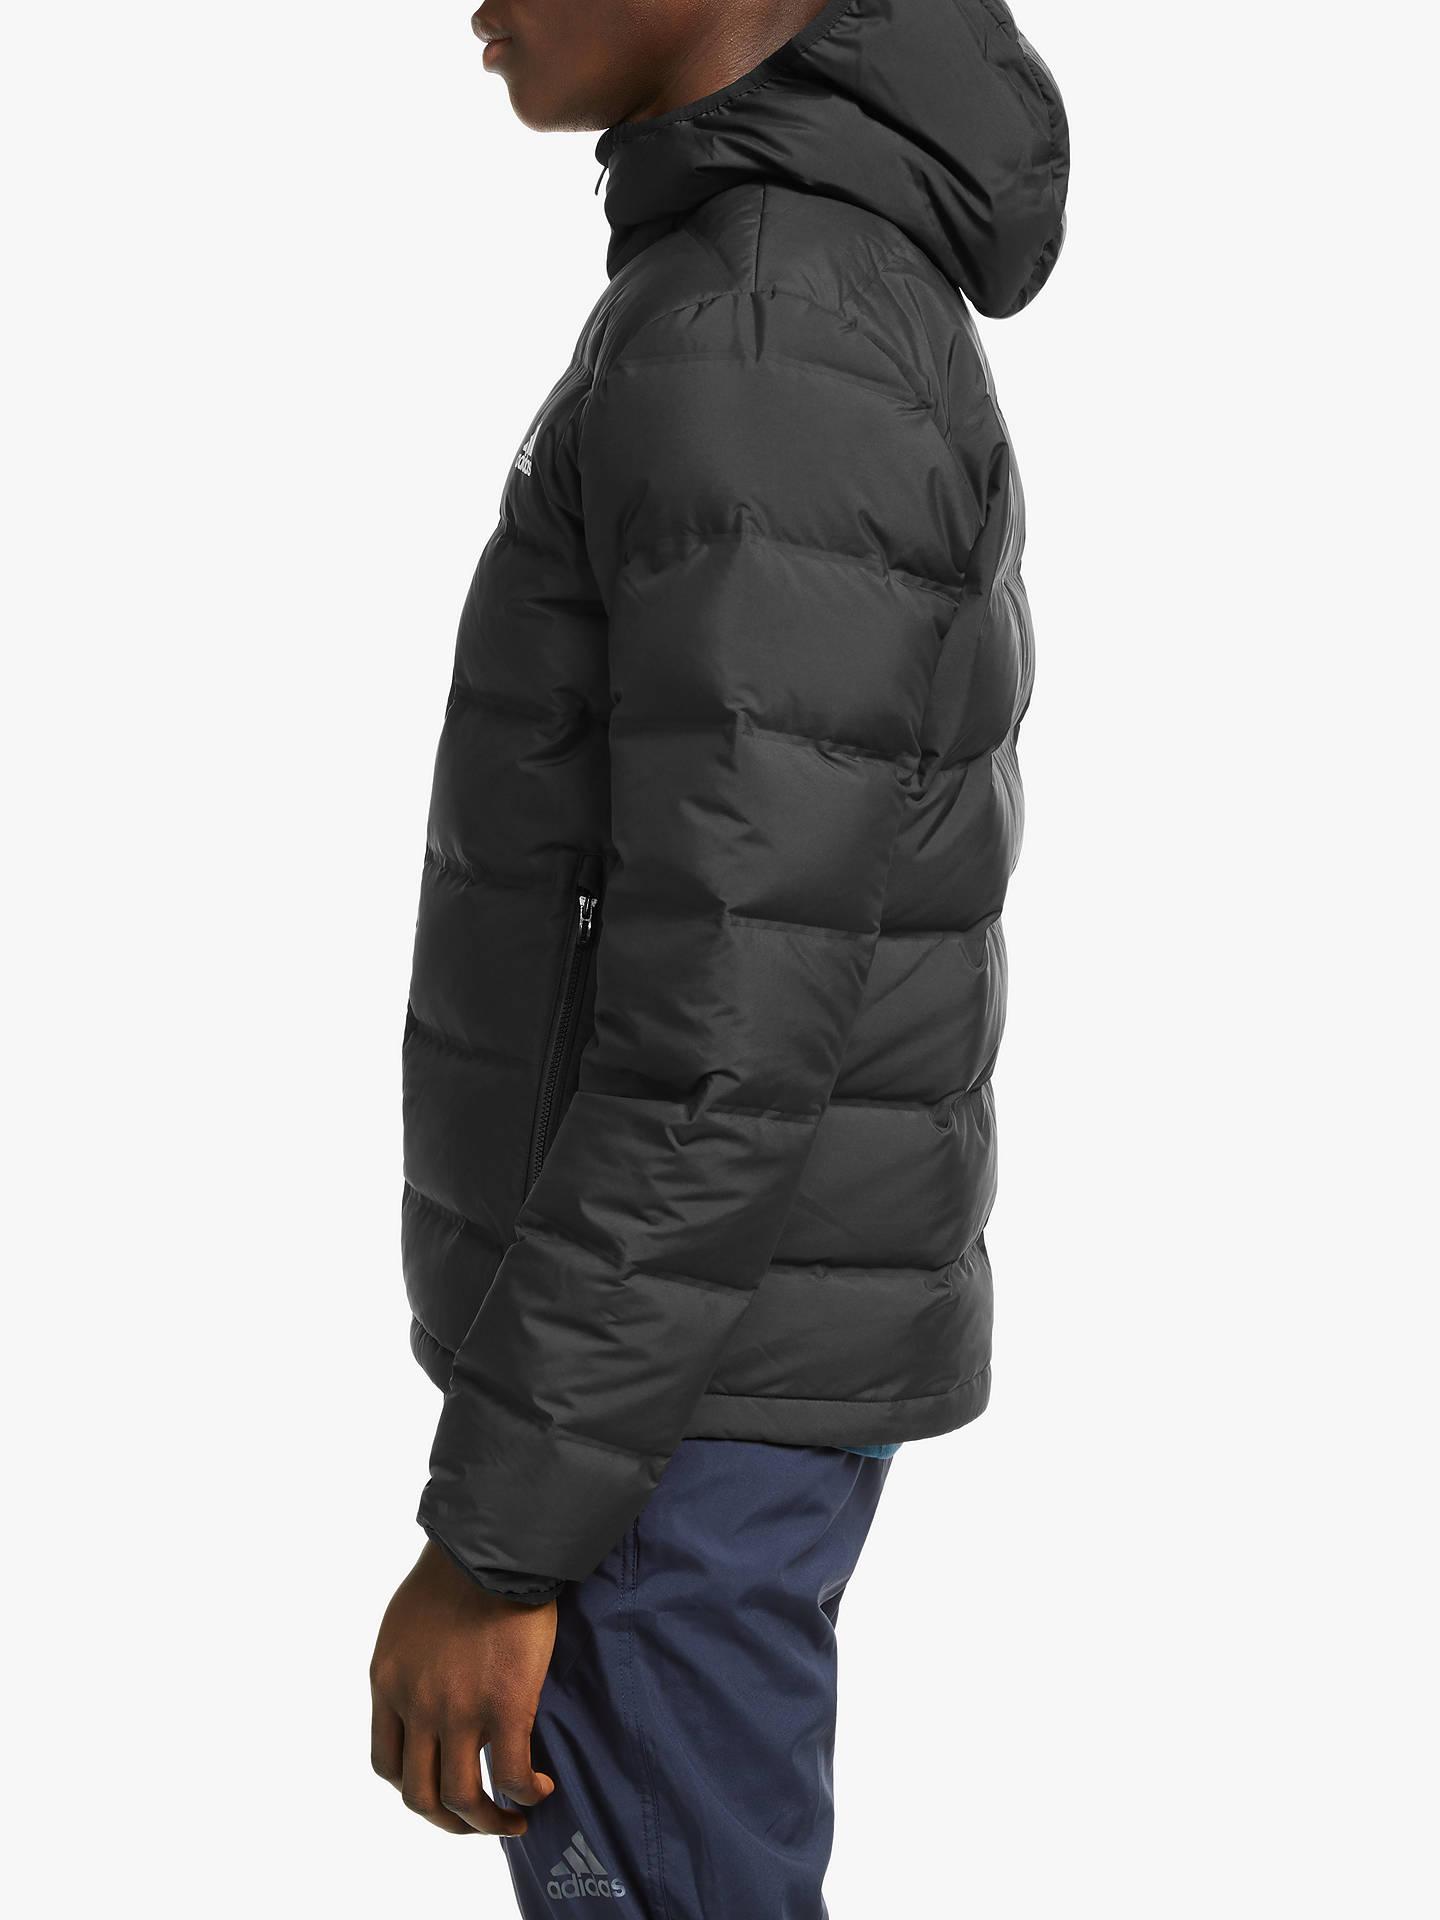 Casi muerto débiles Diez años  adidas Helionic Hooded Down Men's Insulated Jacket, Black at John ...